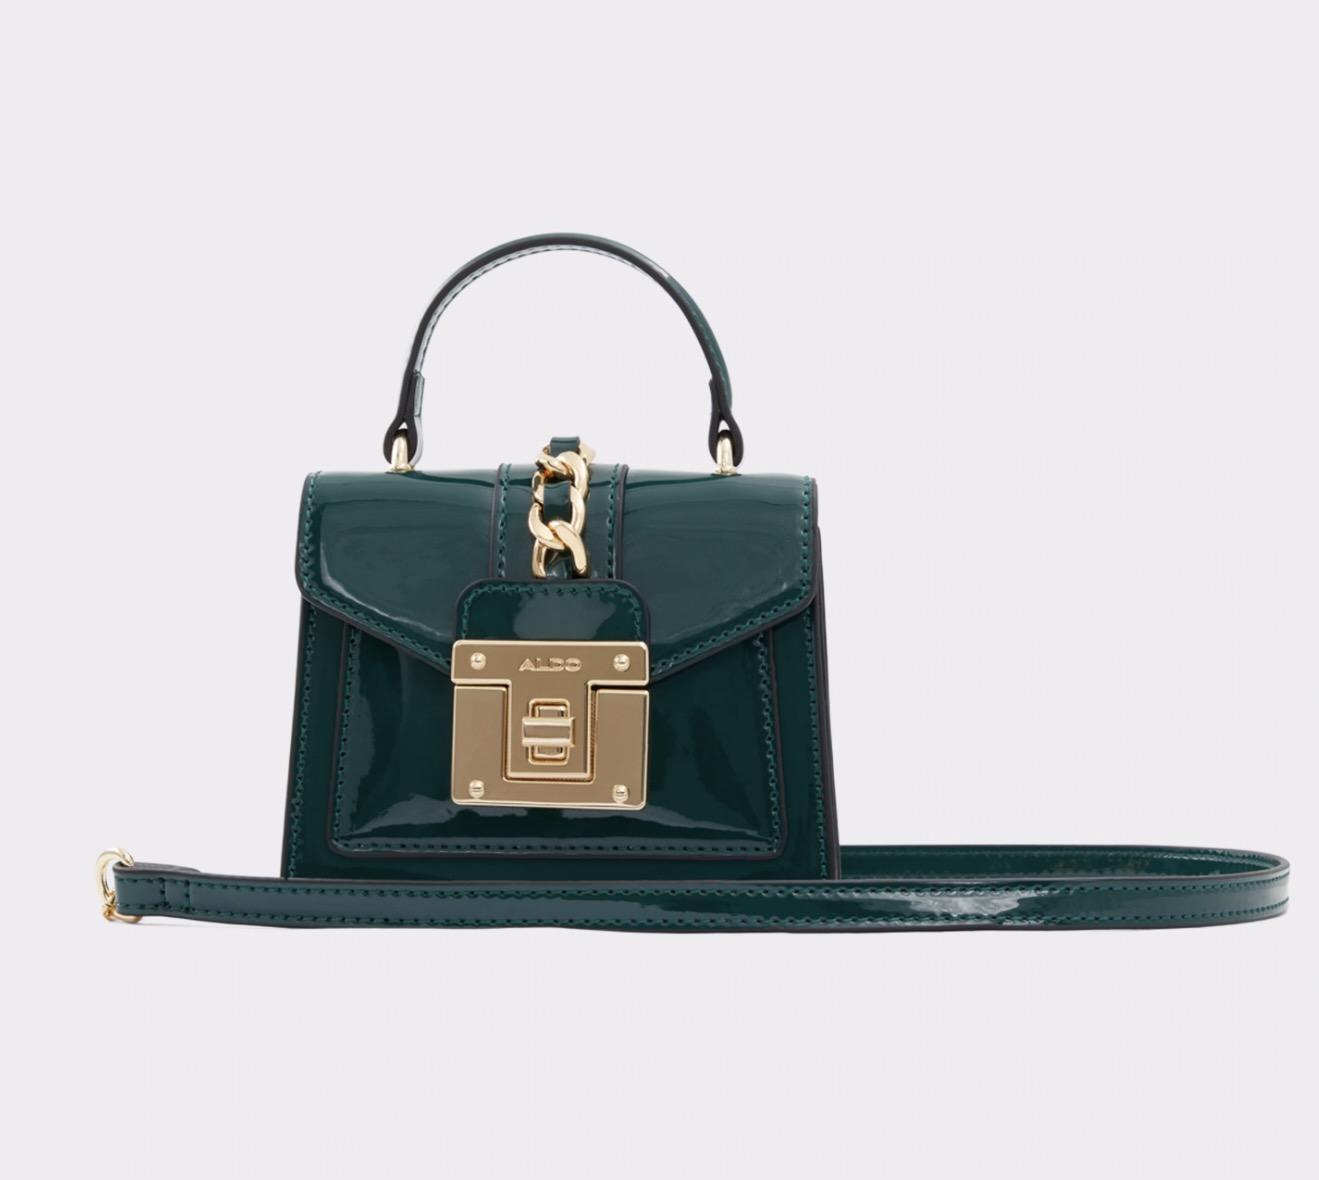 Dark green patent leather handbag from Aldo